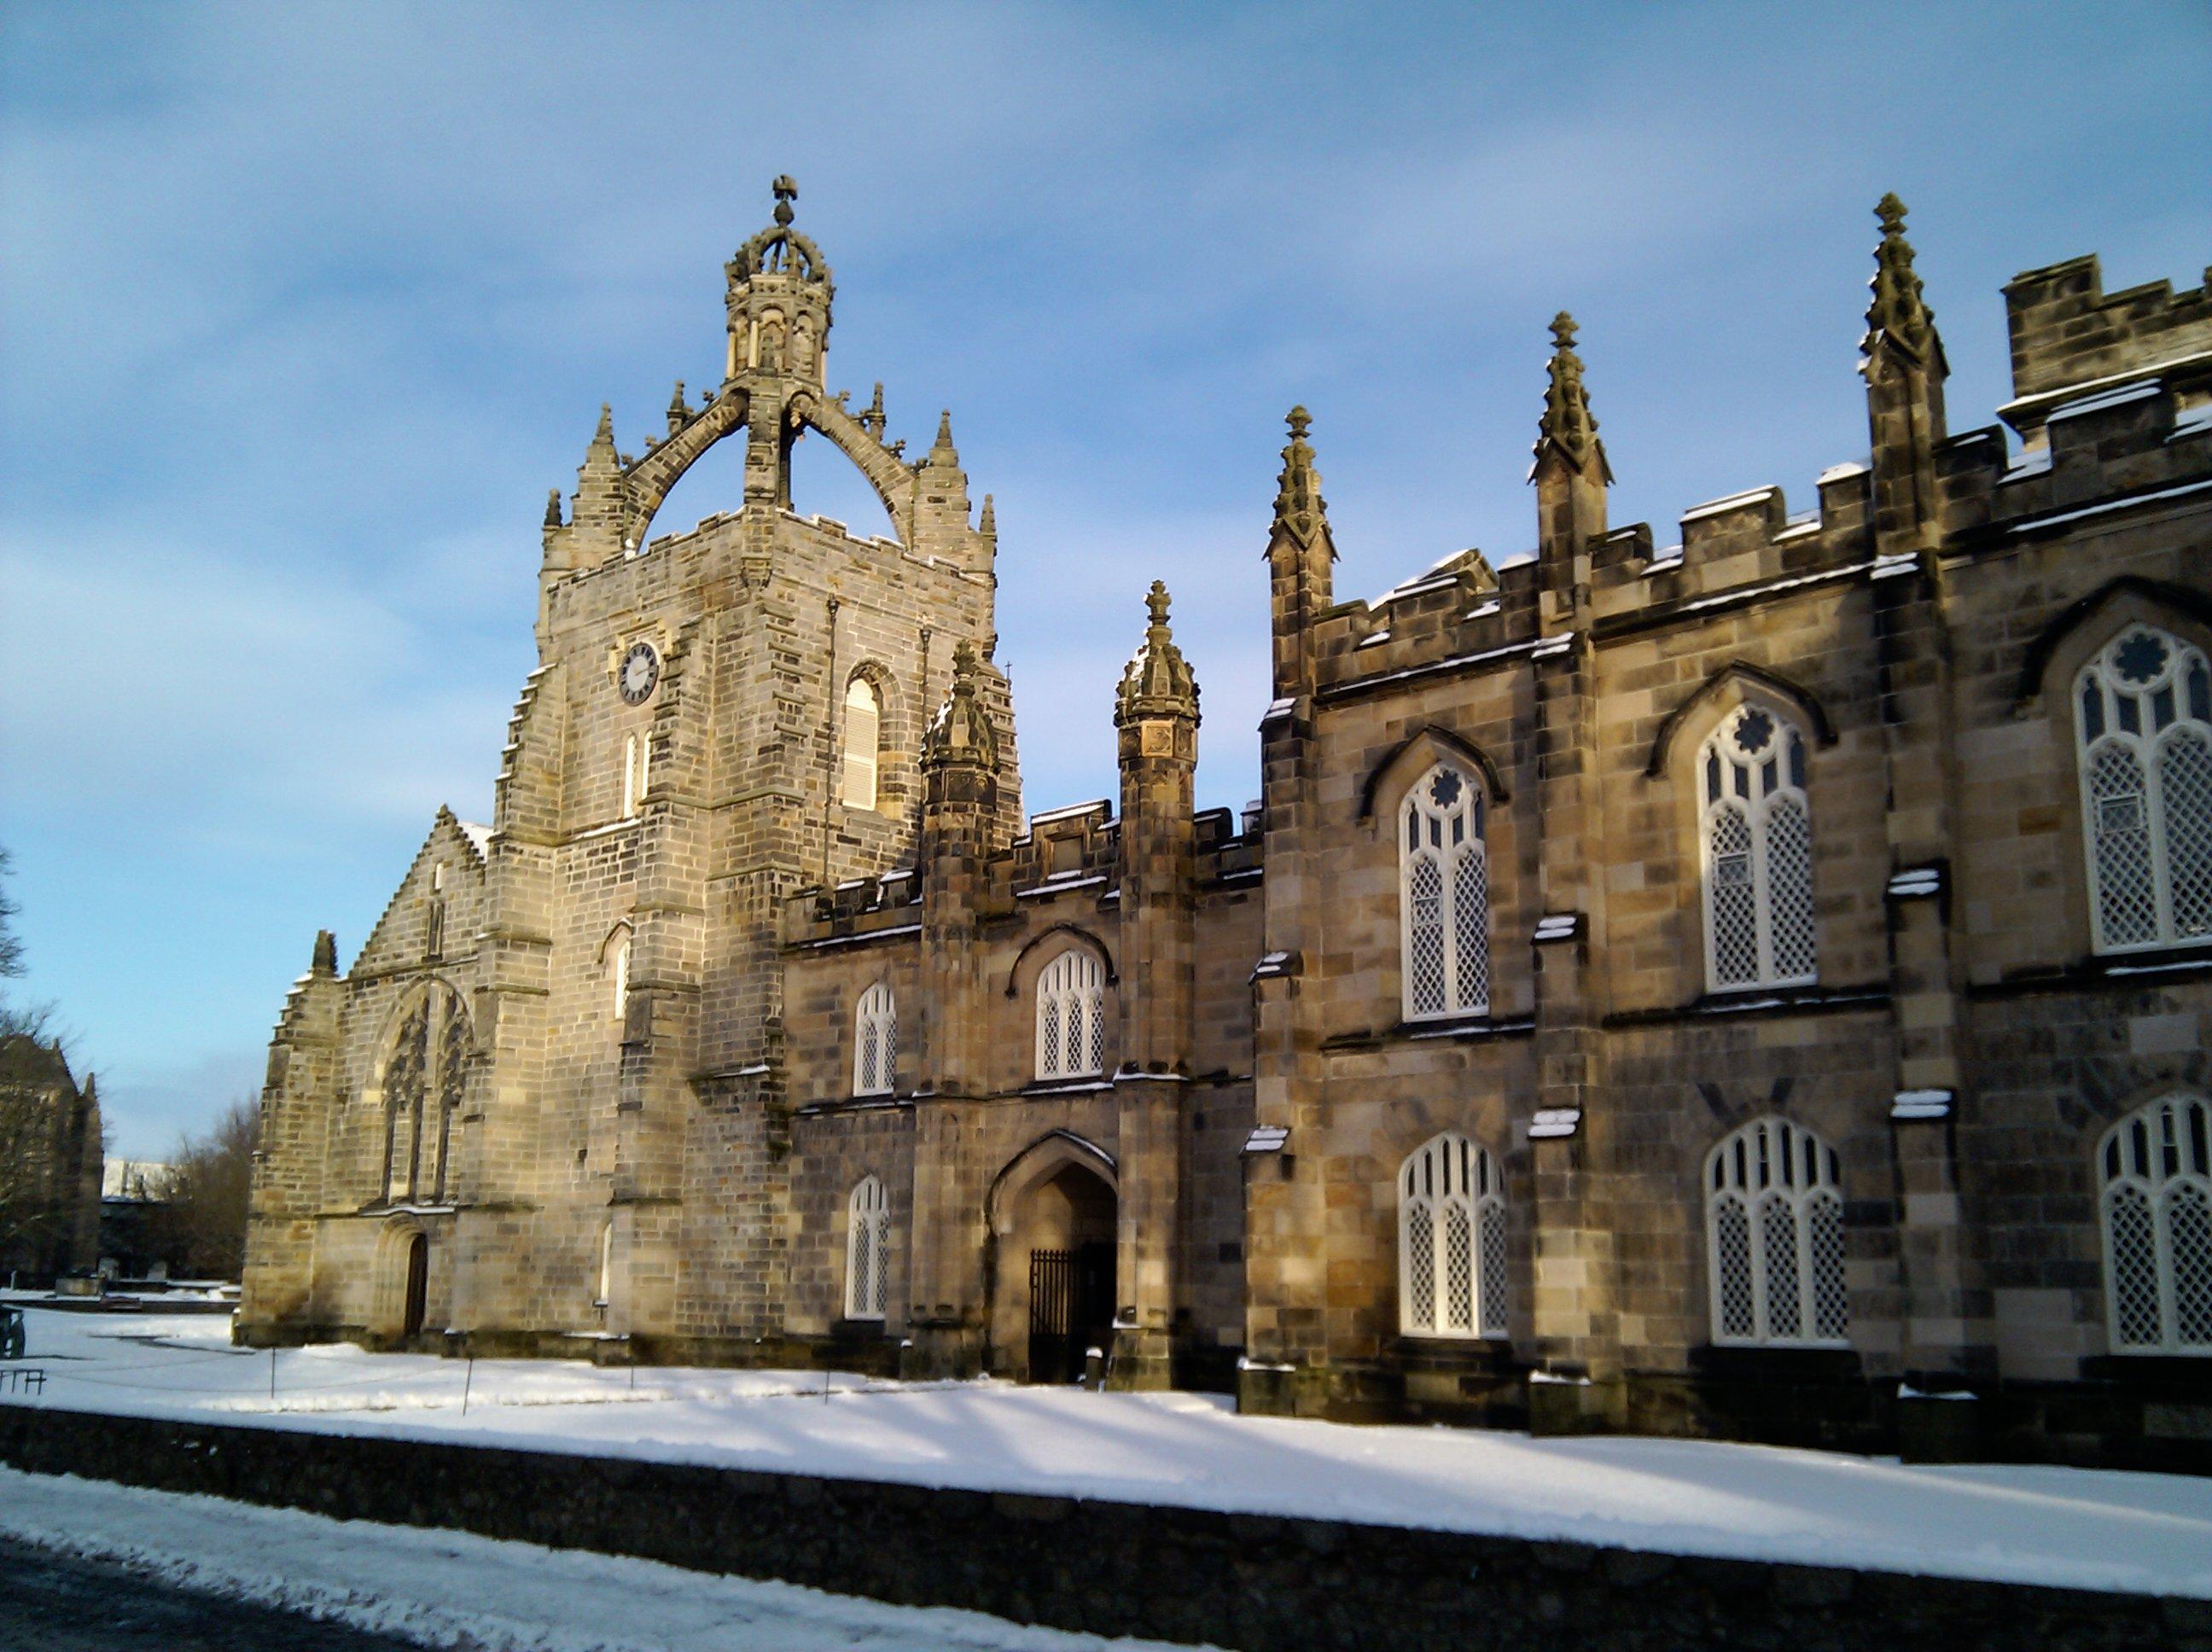 King's College, University of Aberdeen